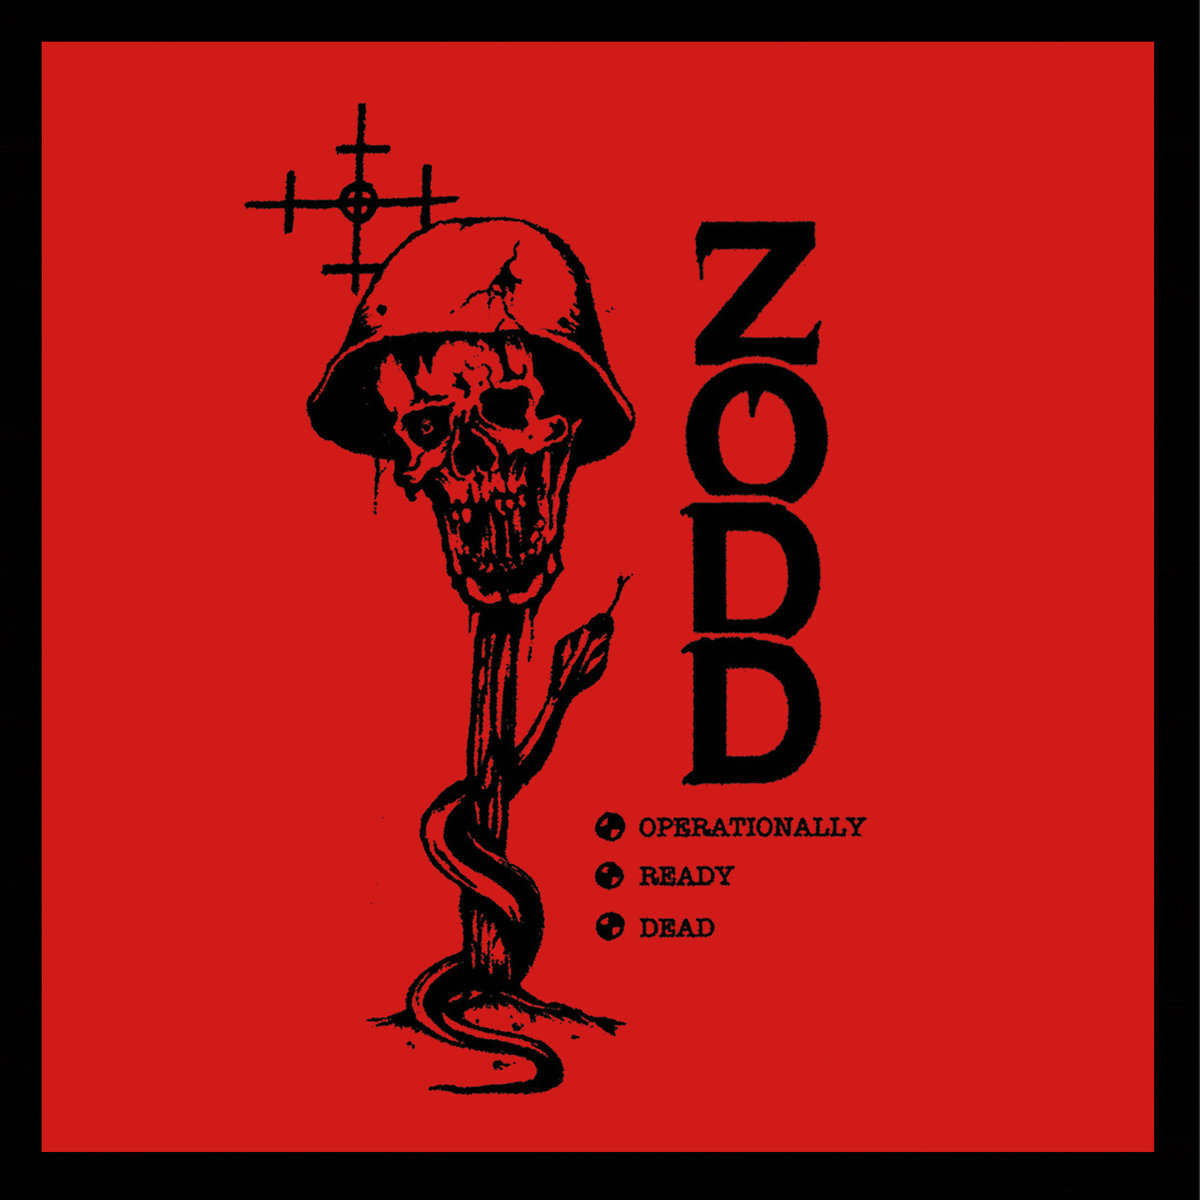 Zodd - Operationally Ready Dead LP